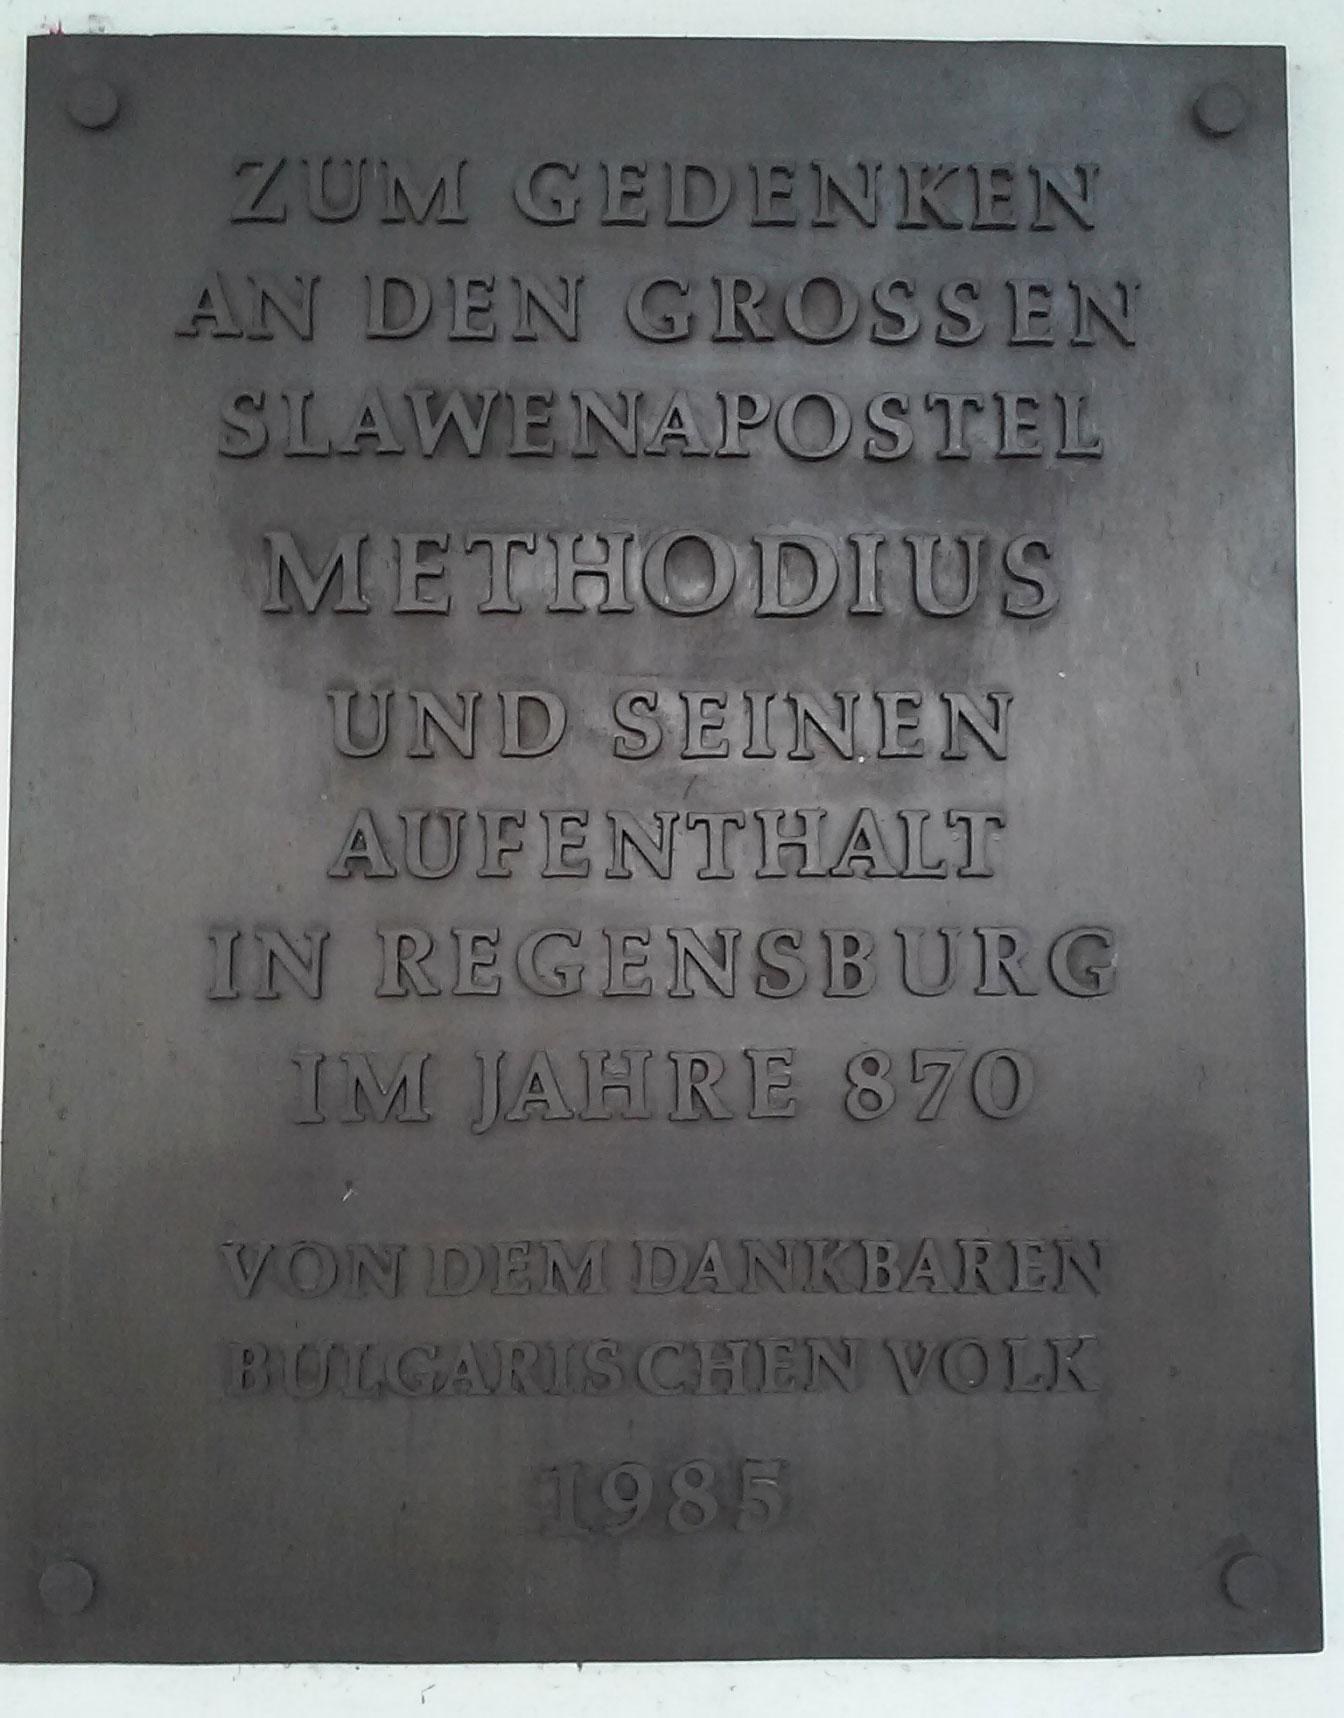 Metod, Regensburg, negacija